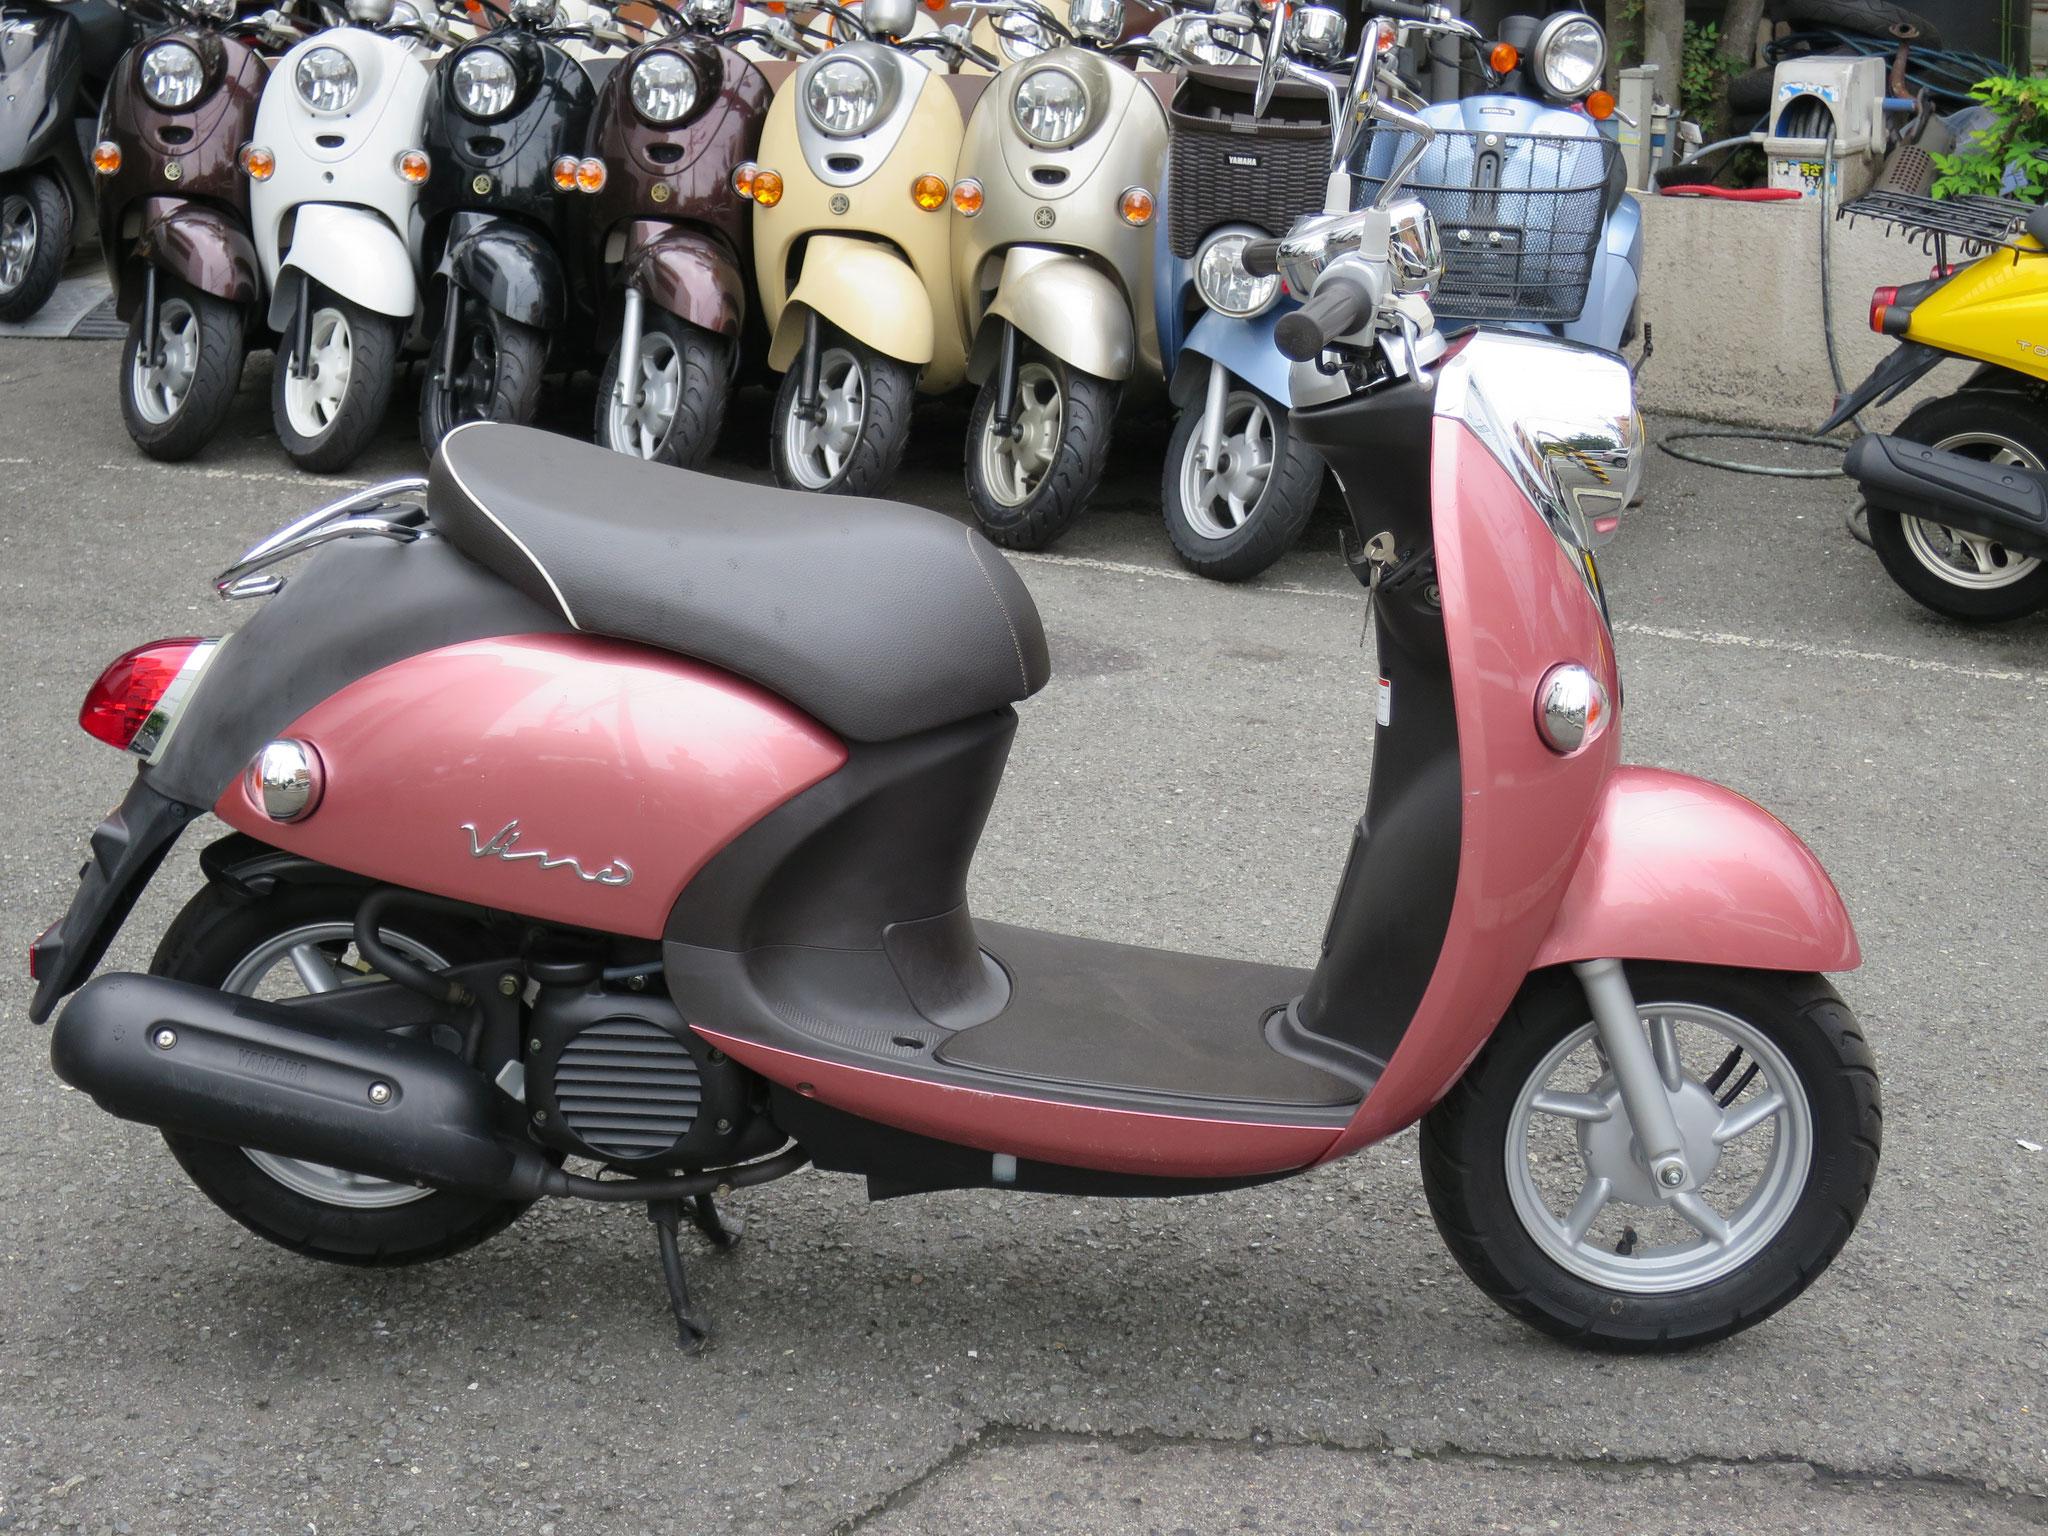 4st ビーノ ピンク/黒